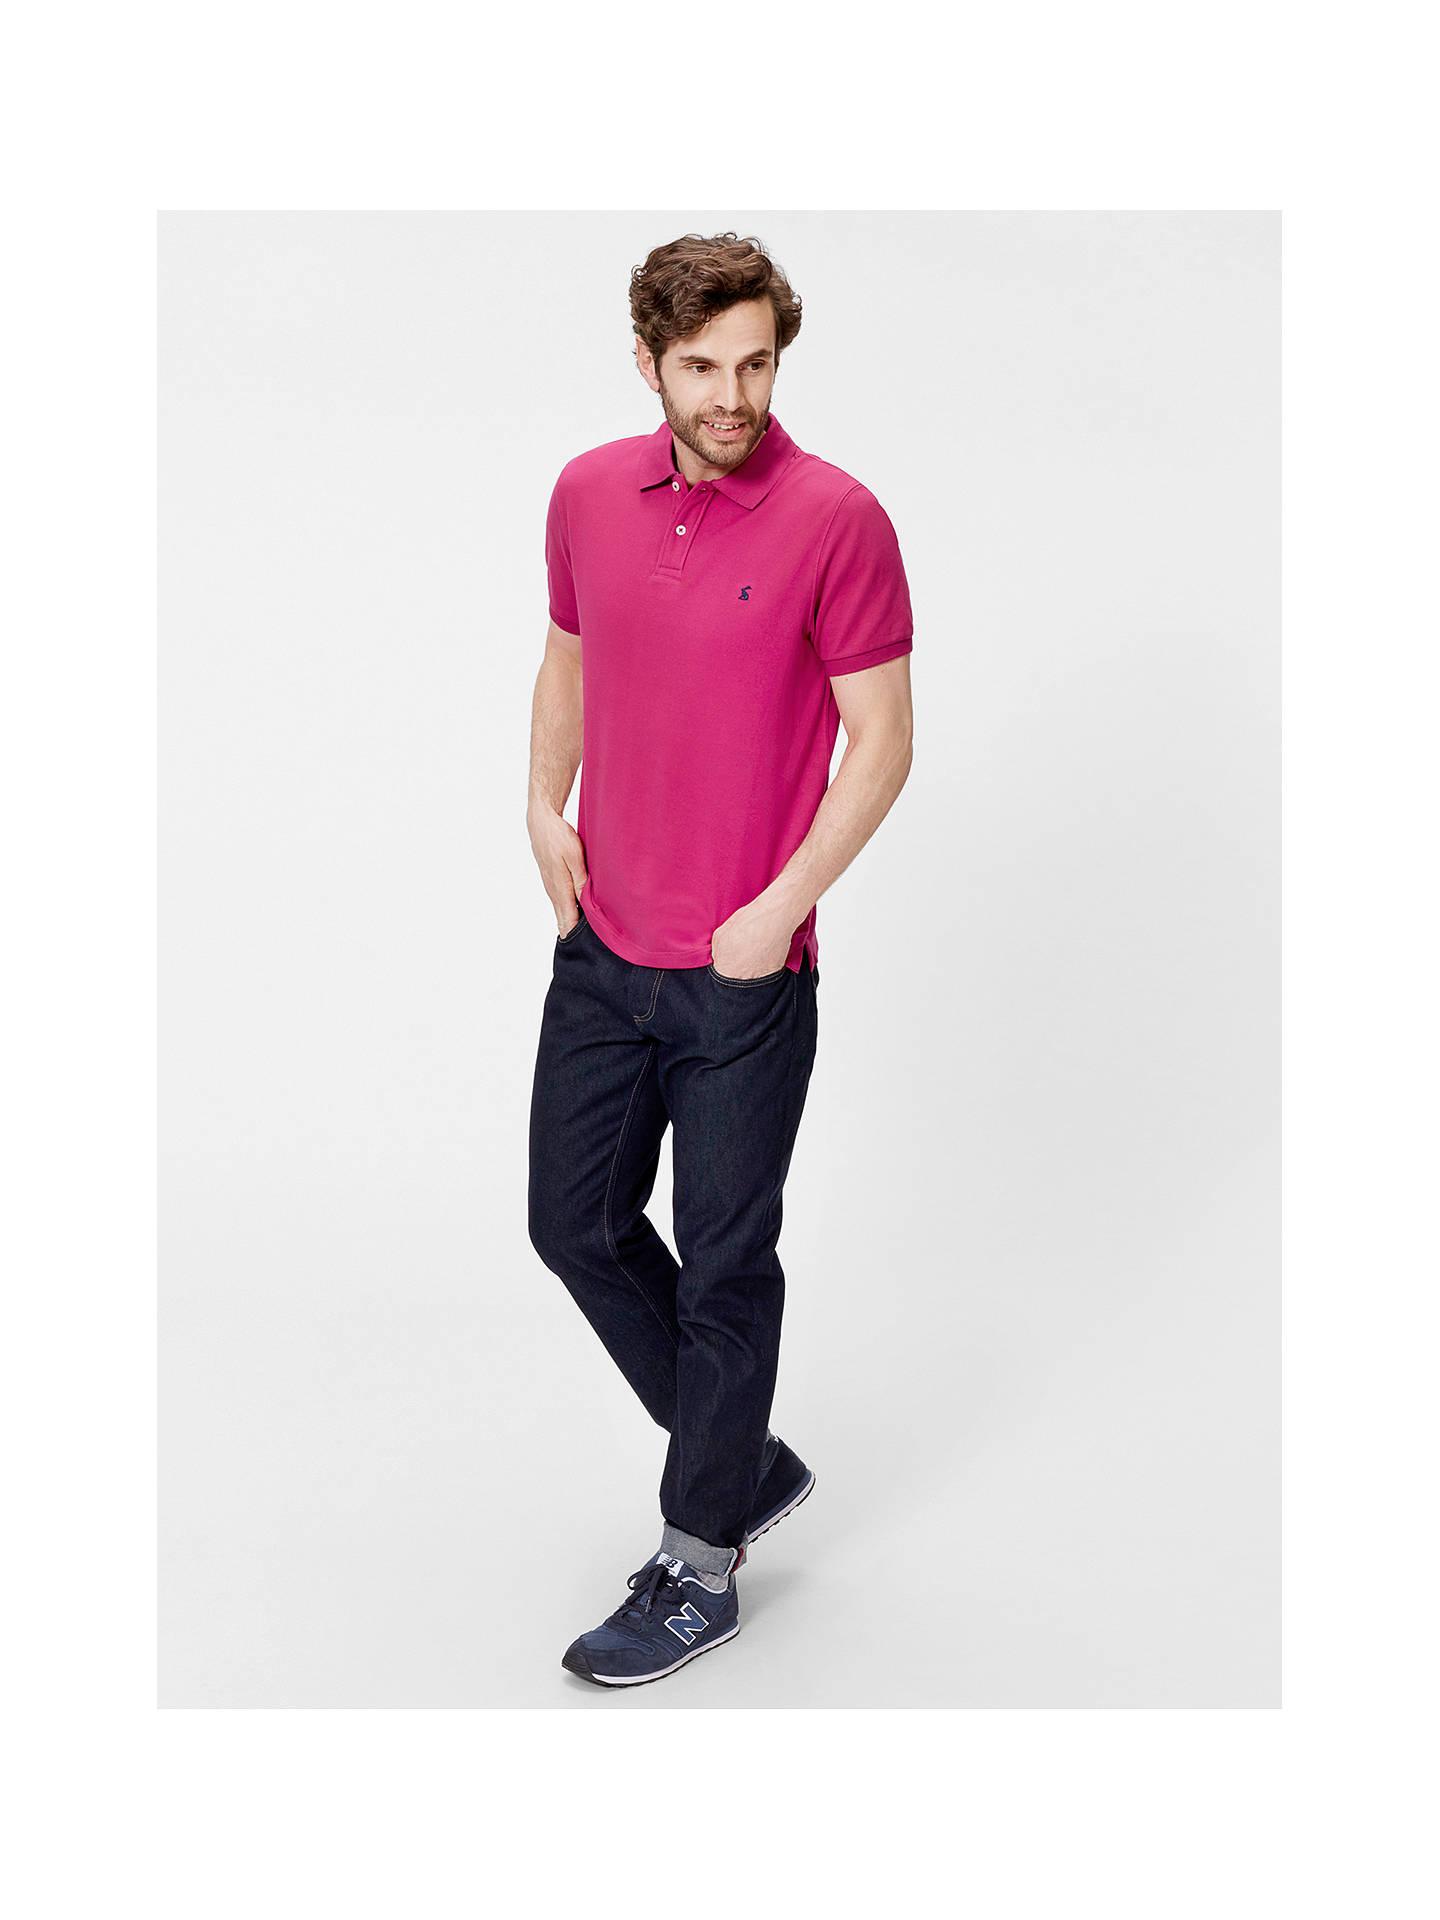 860508337fc Buy Joules Woody Slim Fit Polo Shirt, Dark Ruby, S Online at johnlewis.